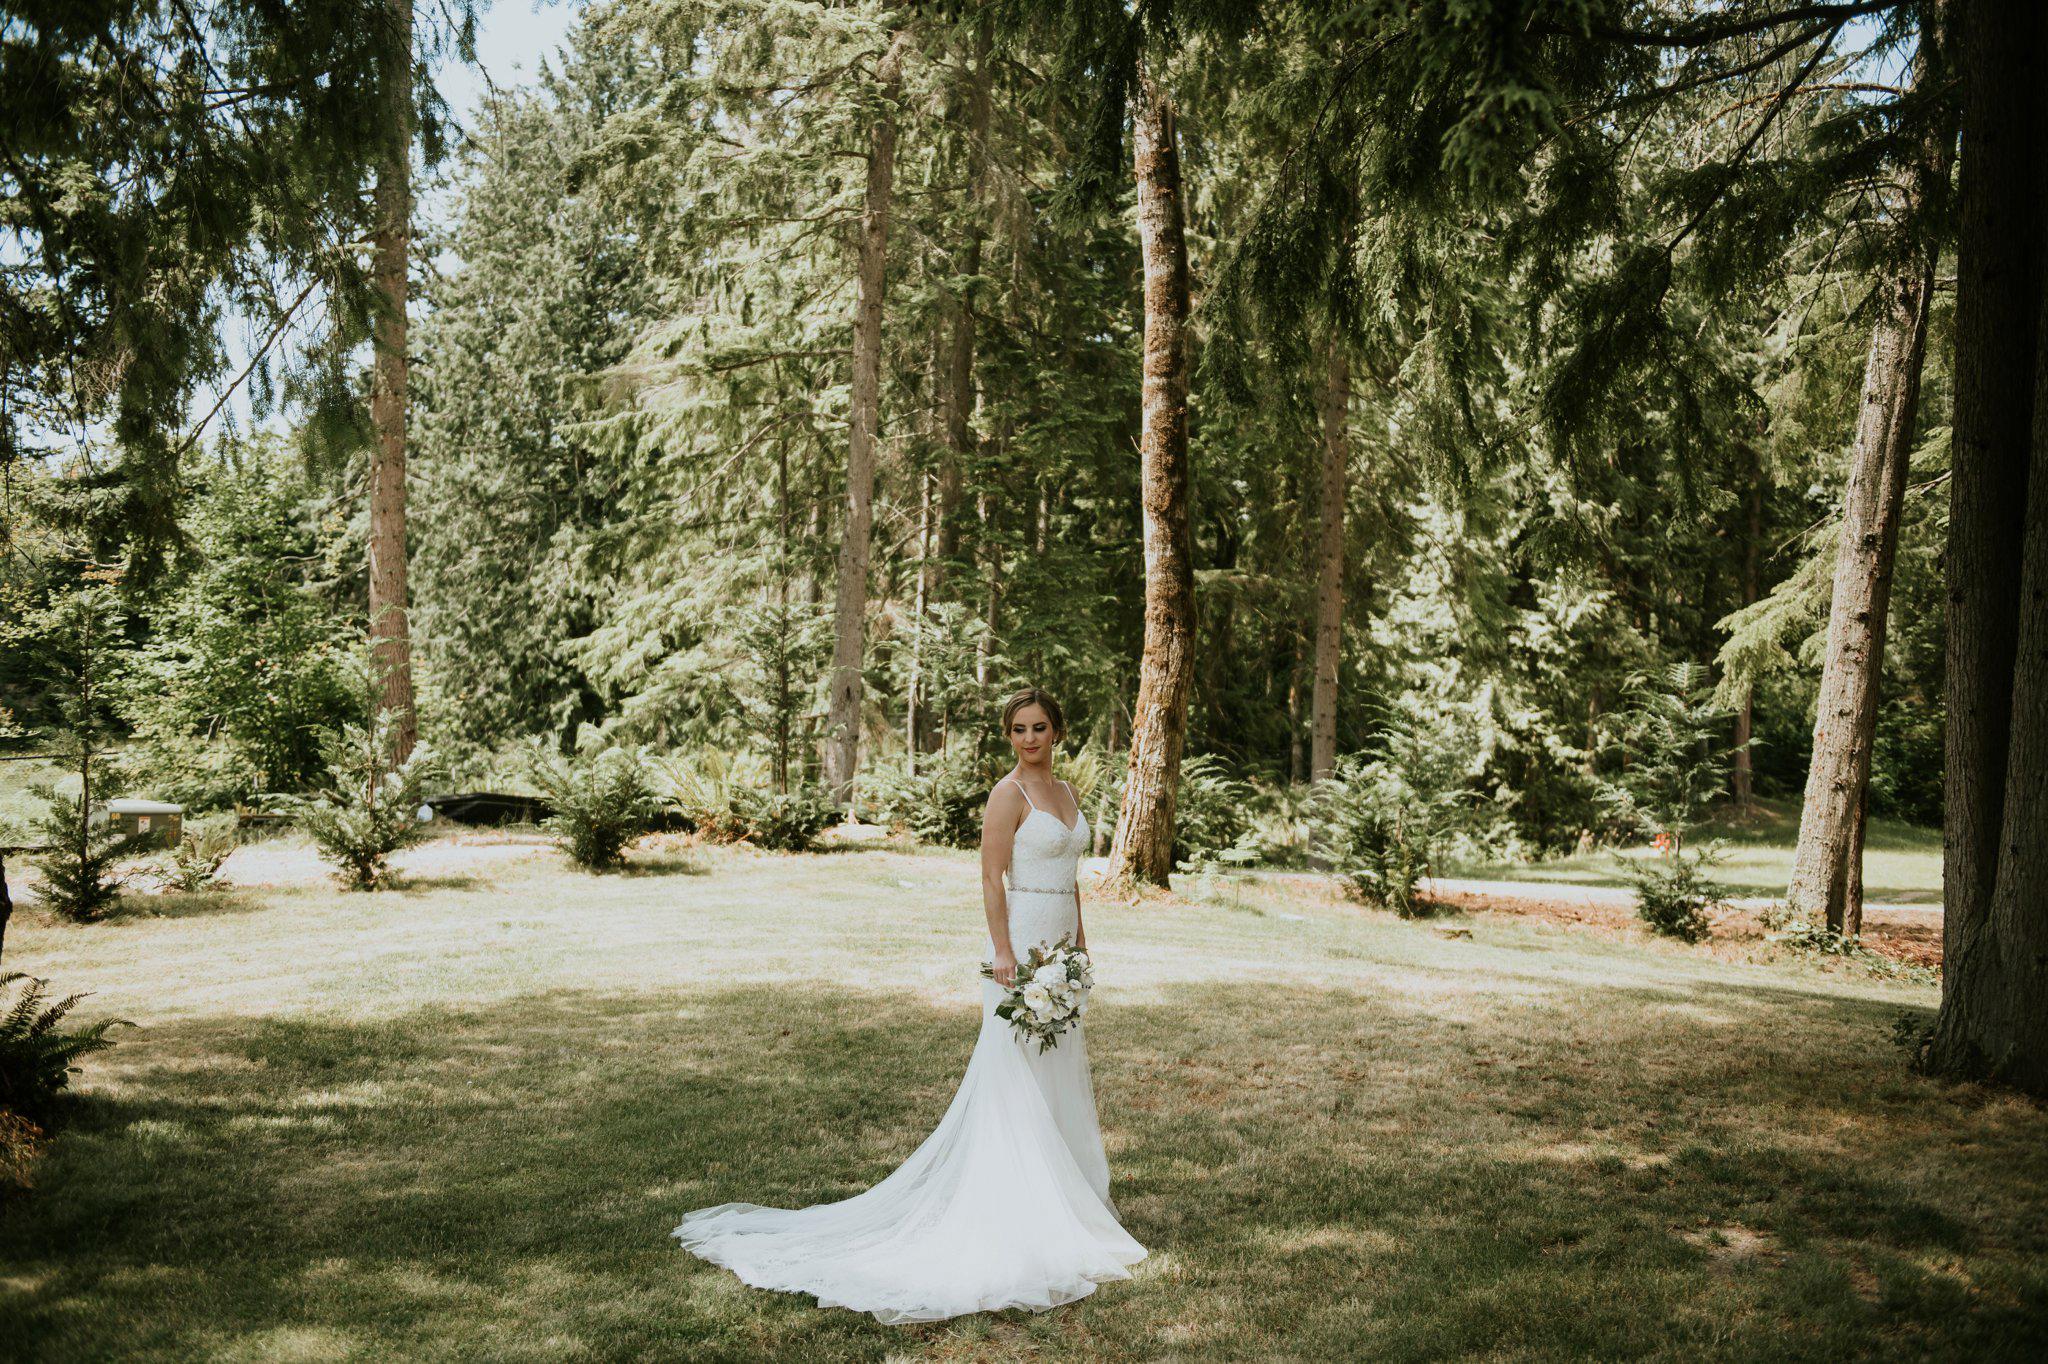 hollywood-school-house-wedding-seattle-photographer-caitlyn-nikula-27.jpg